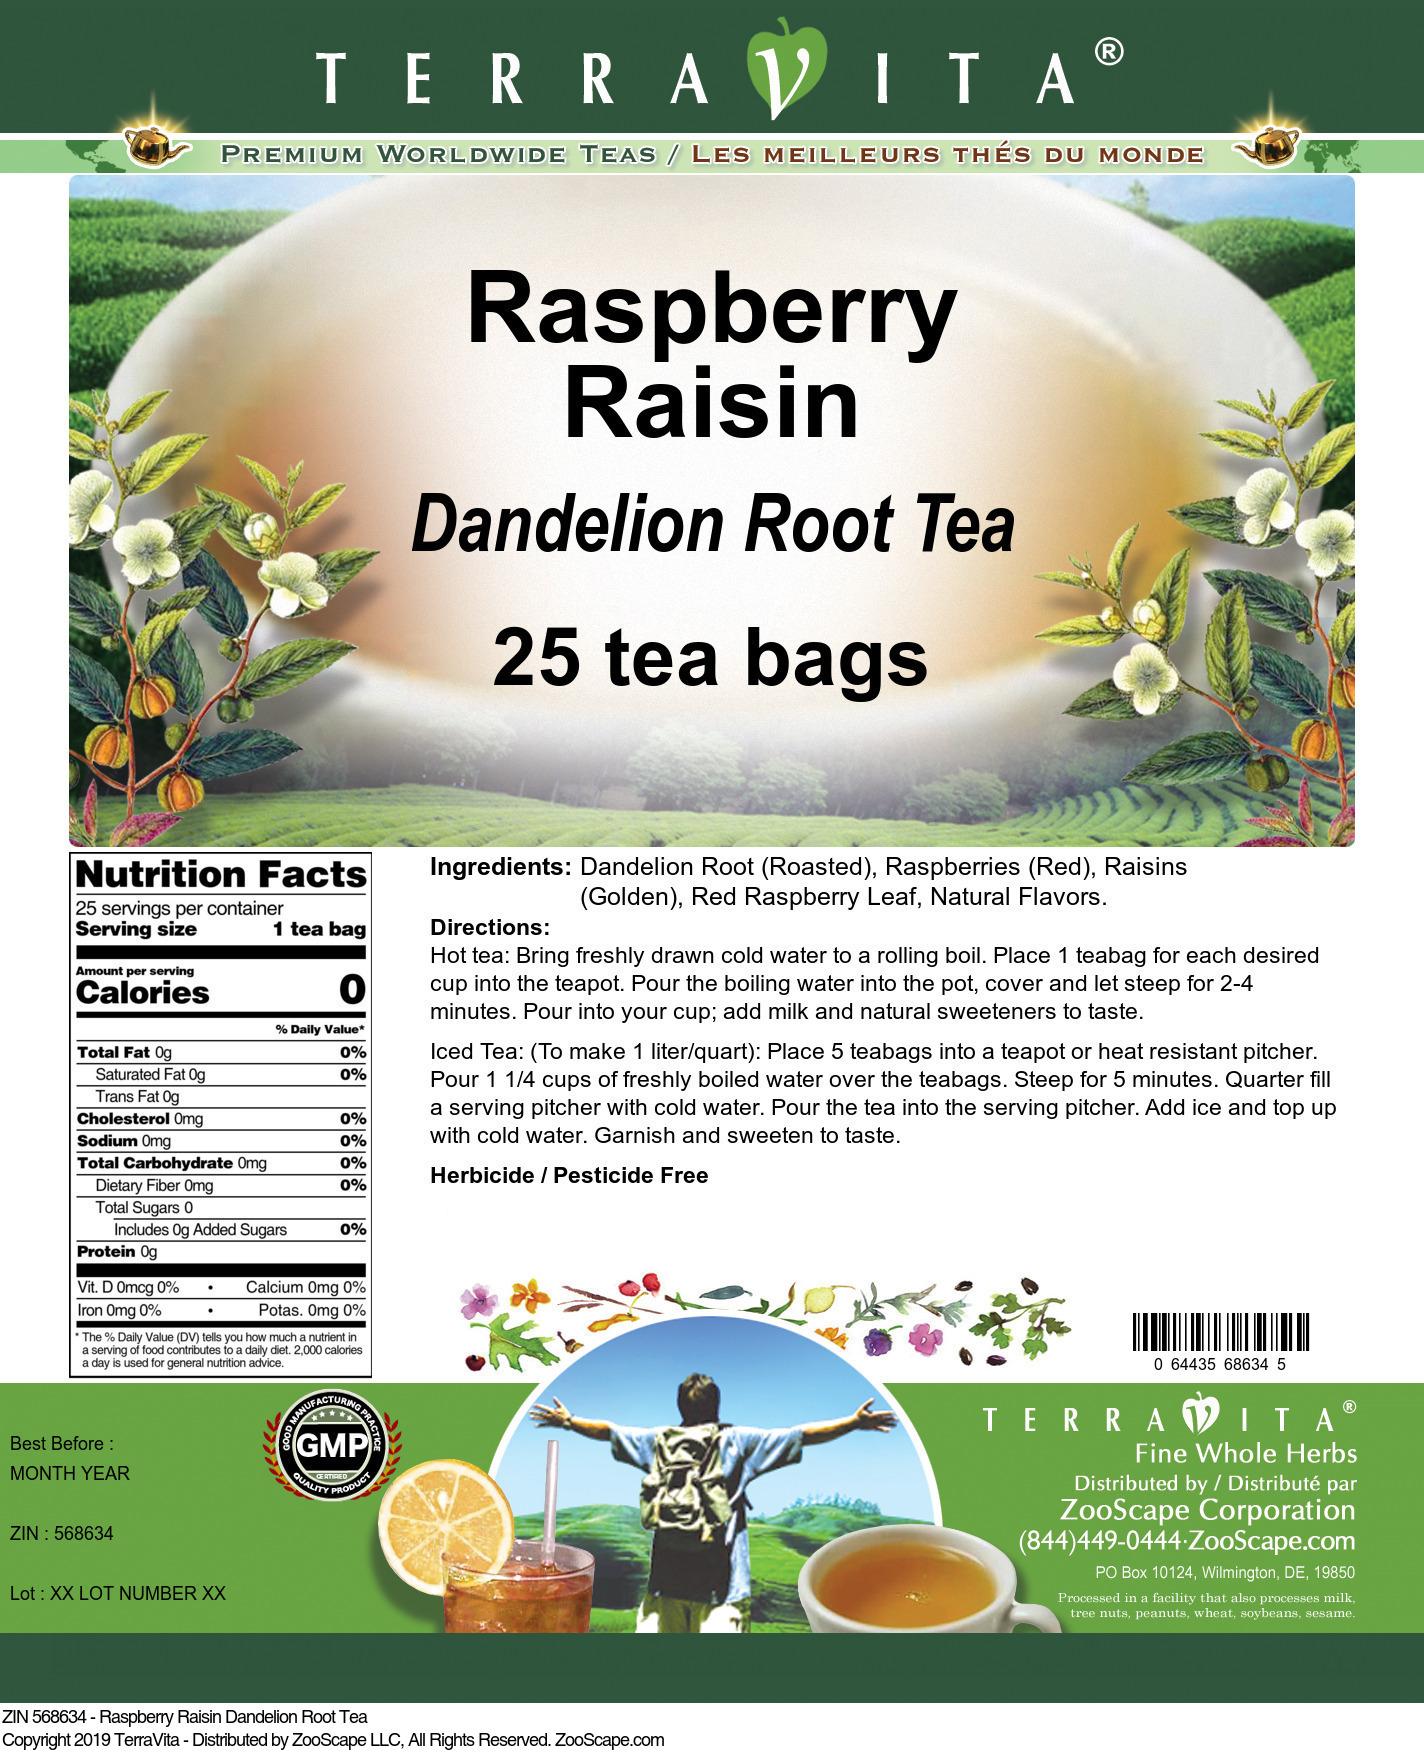 Raspberry Raisin Dandelion Root Tea